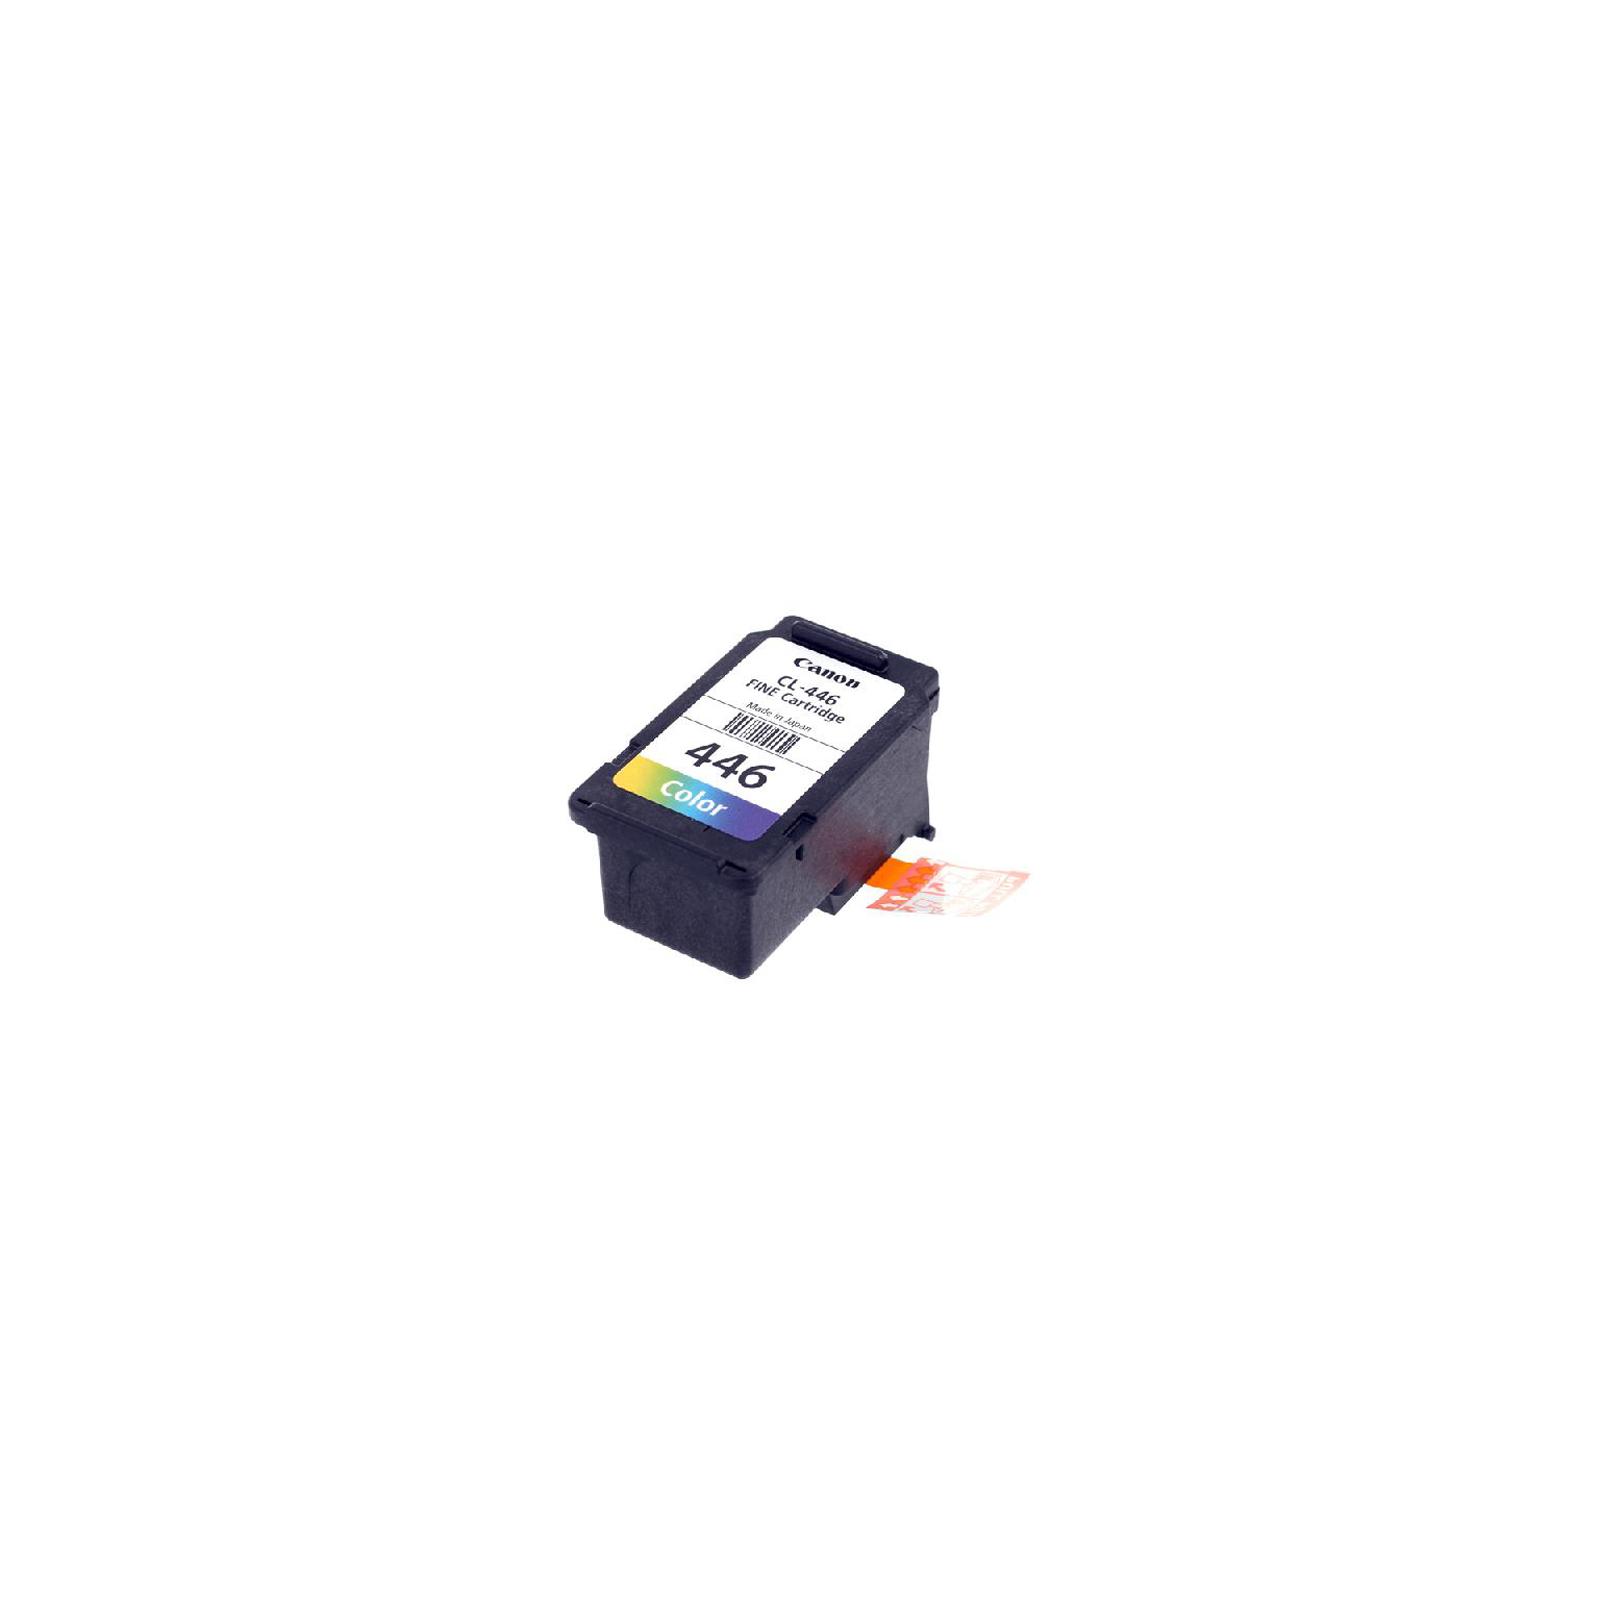 Картридж Canon PG-445 MULTI (Black+Color) (8283B004) изображение 4